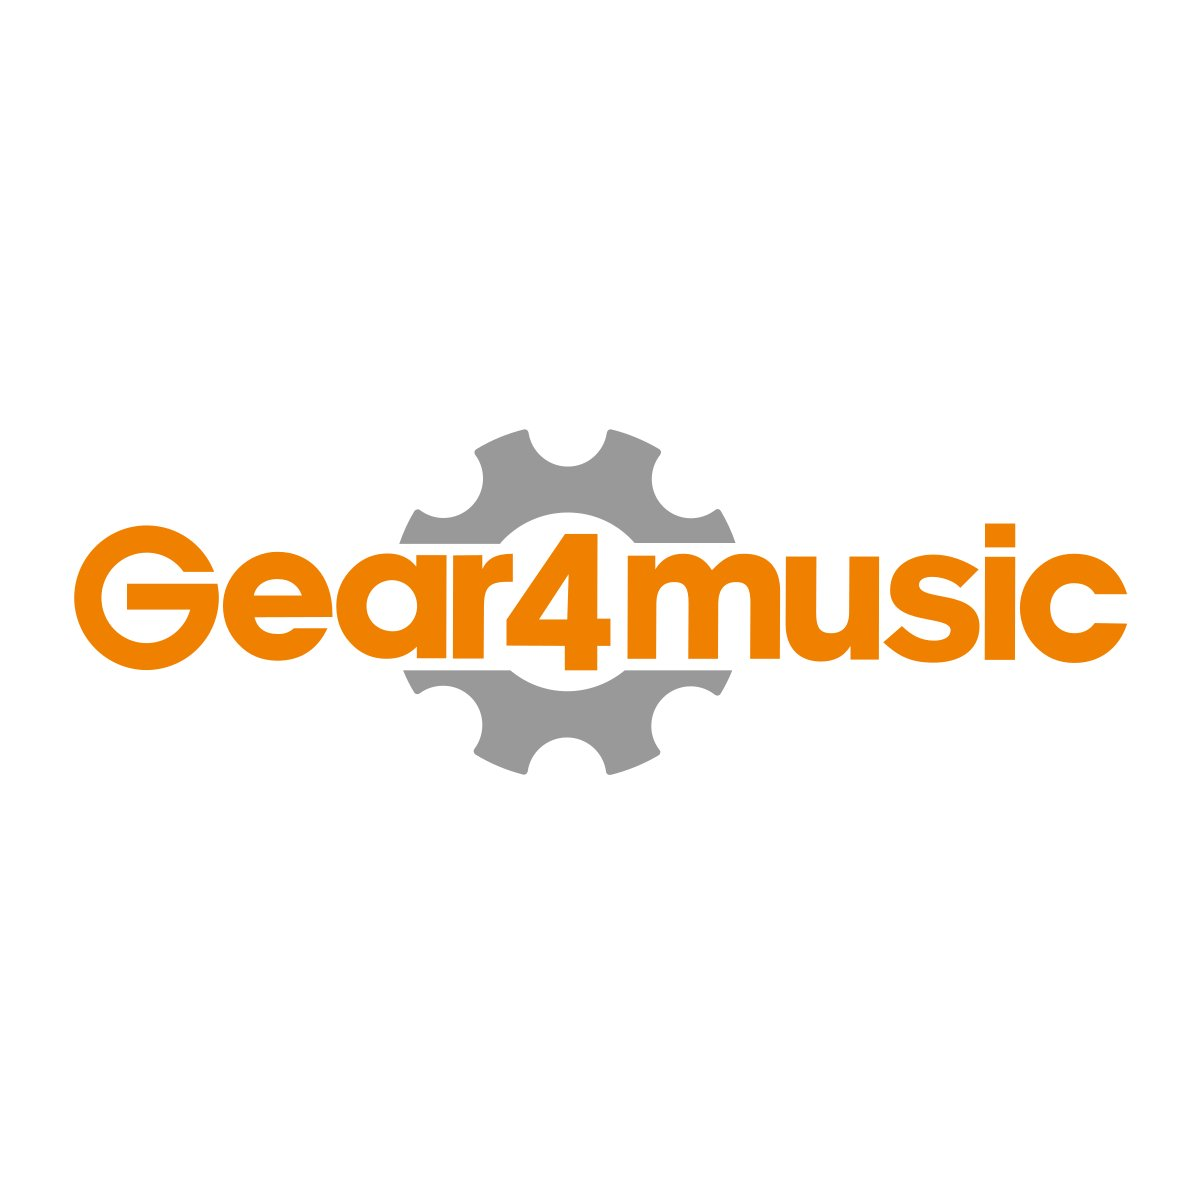 violoncelles taille standard 4 4 chez gear4music. Black Bedroom Furniture Sets. Home Design Ideas